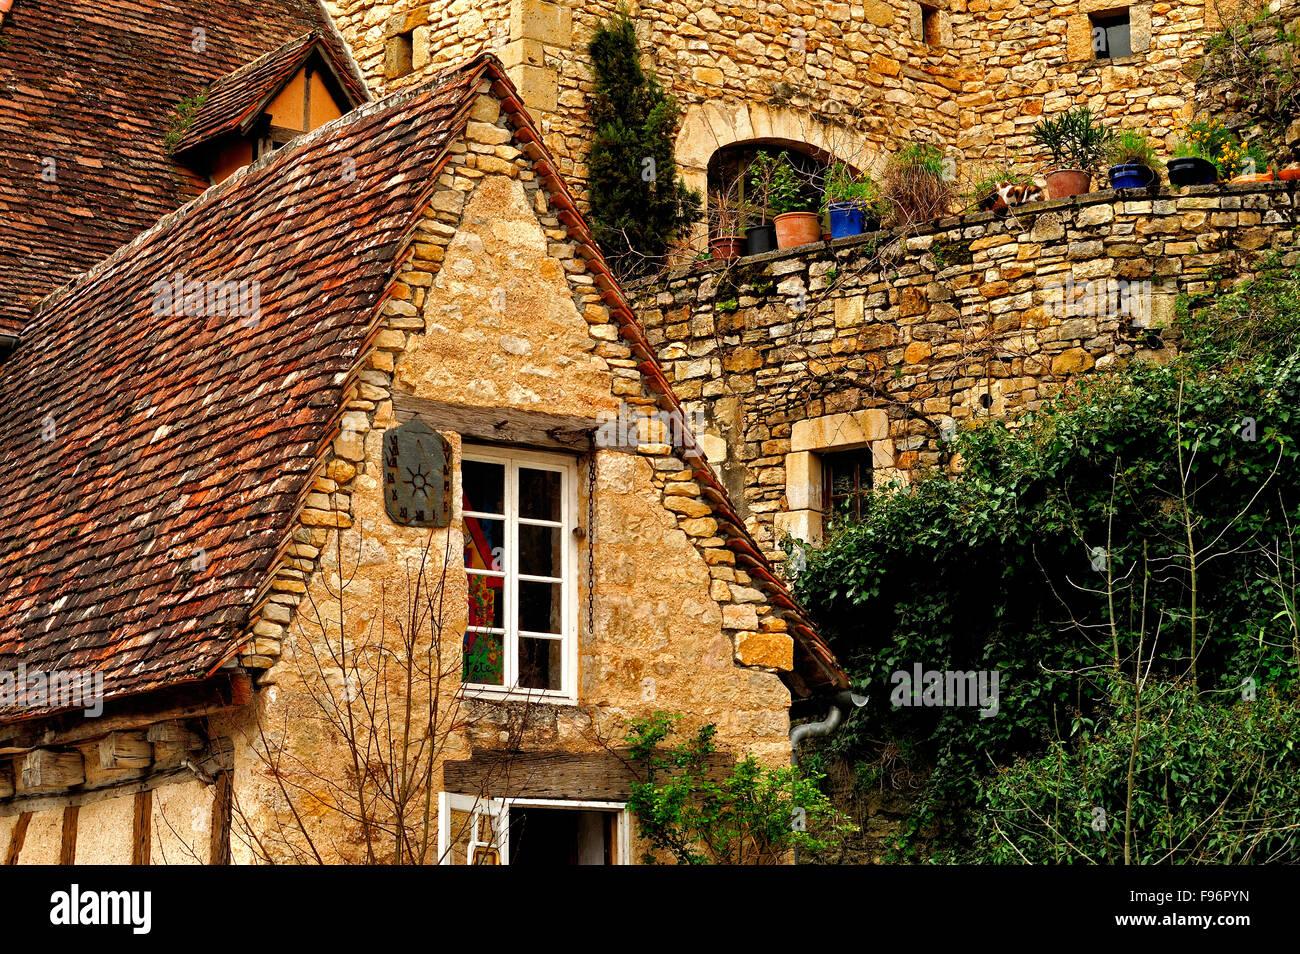 architectural detail, Rocamadour, Lot Department, Aquitaine, France - Stock Image